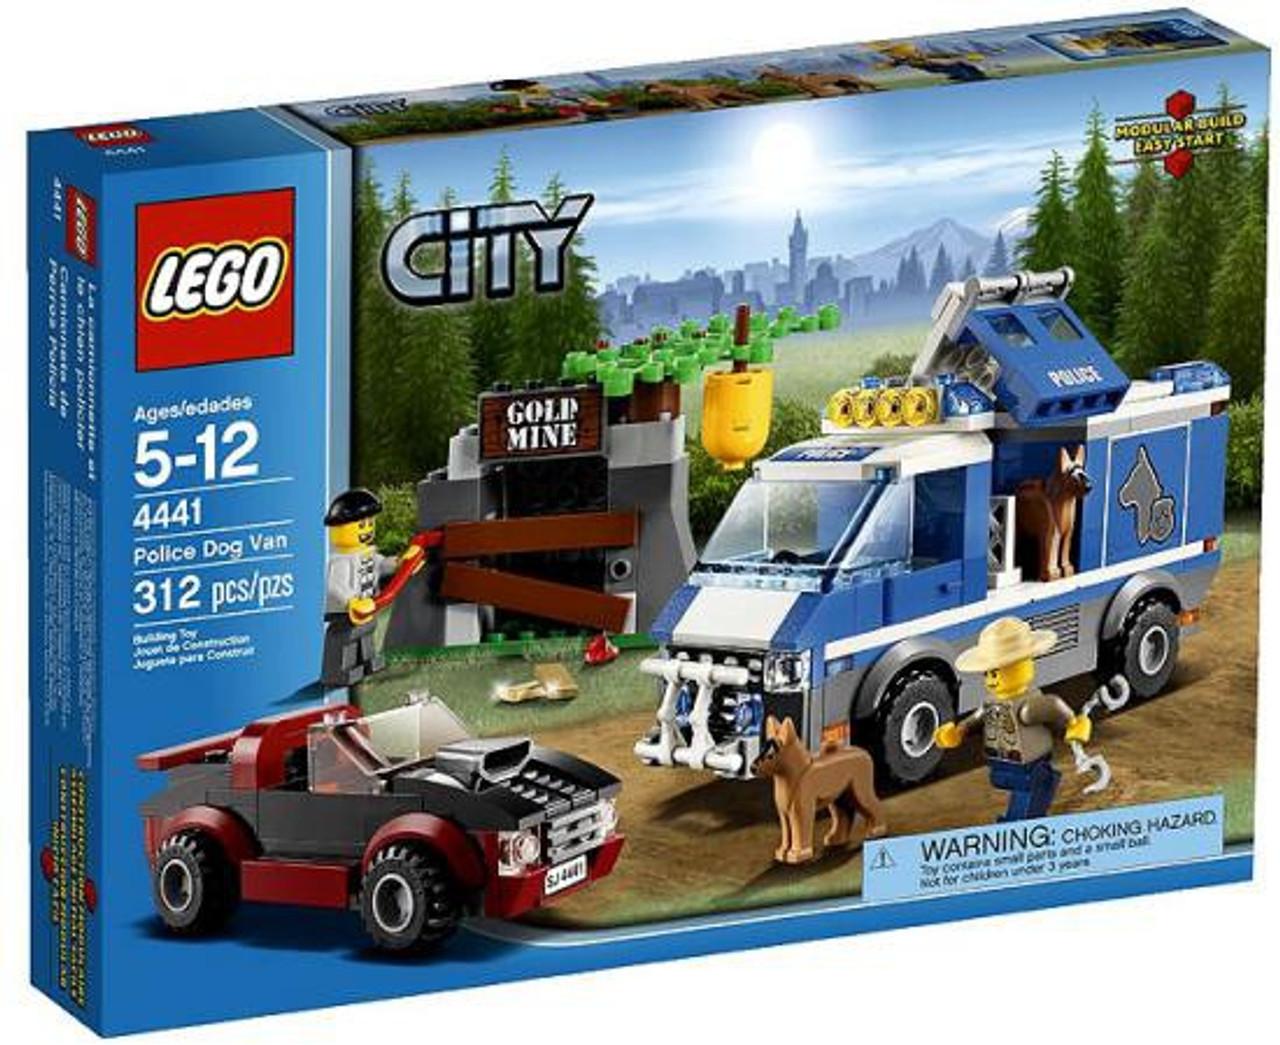 lego city police dog van set 4441 - Lgo City Police